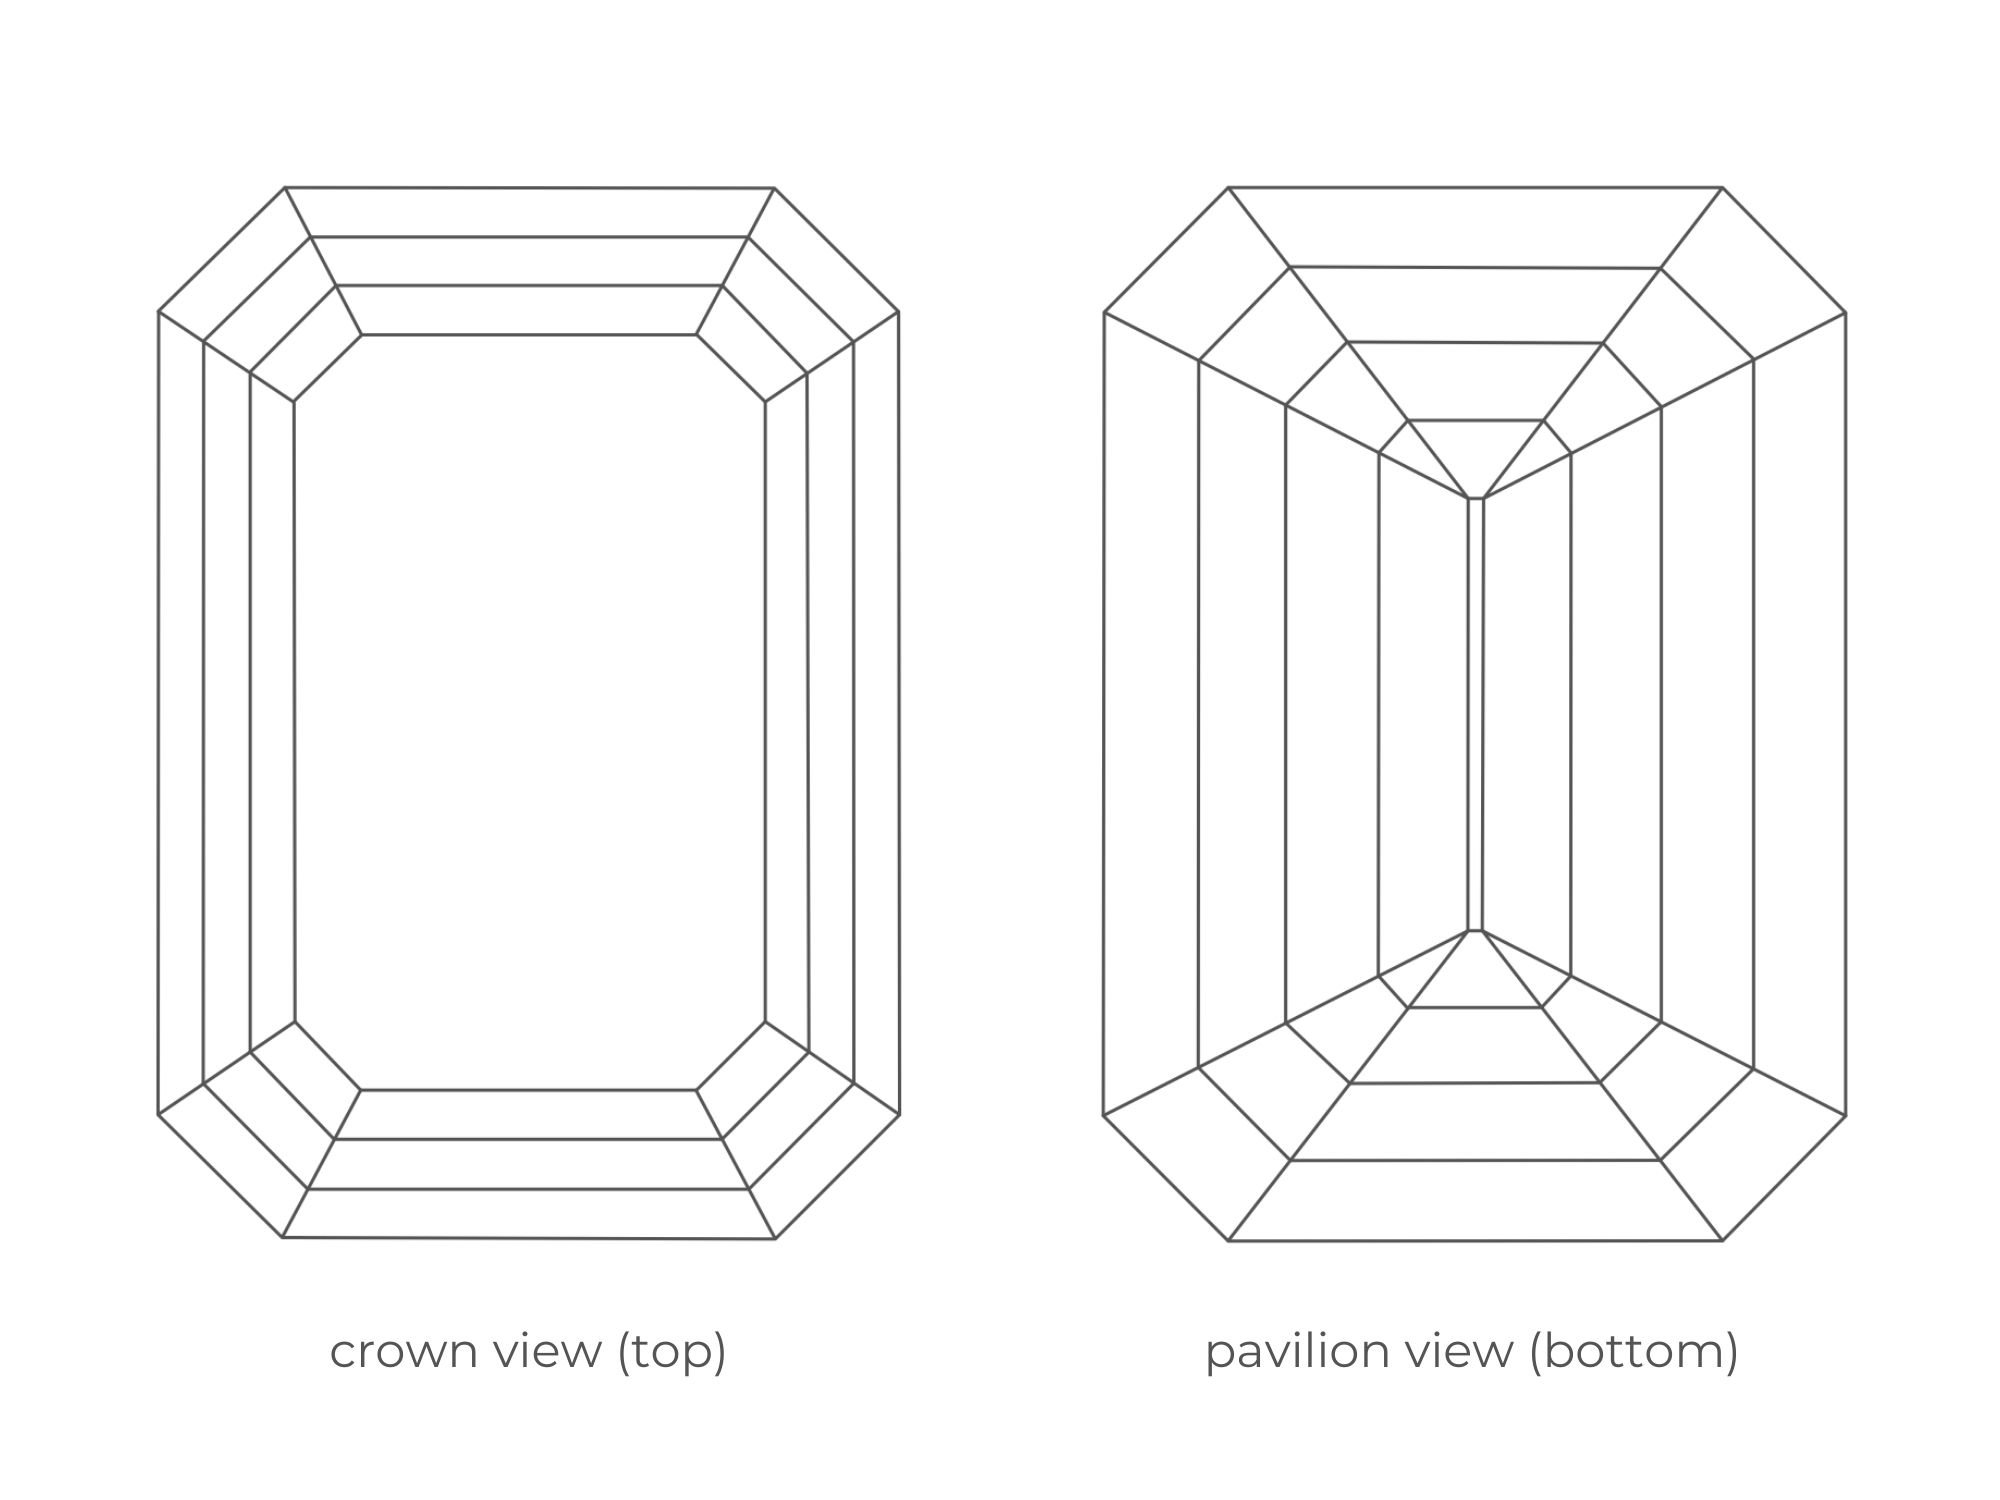 Emerald Cut Diamond Facet Arrangement | Diamond Buzz